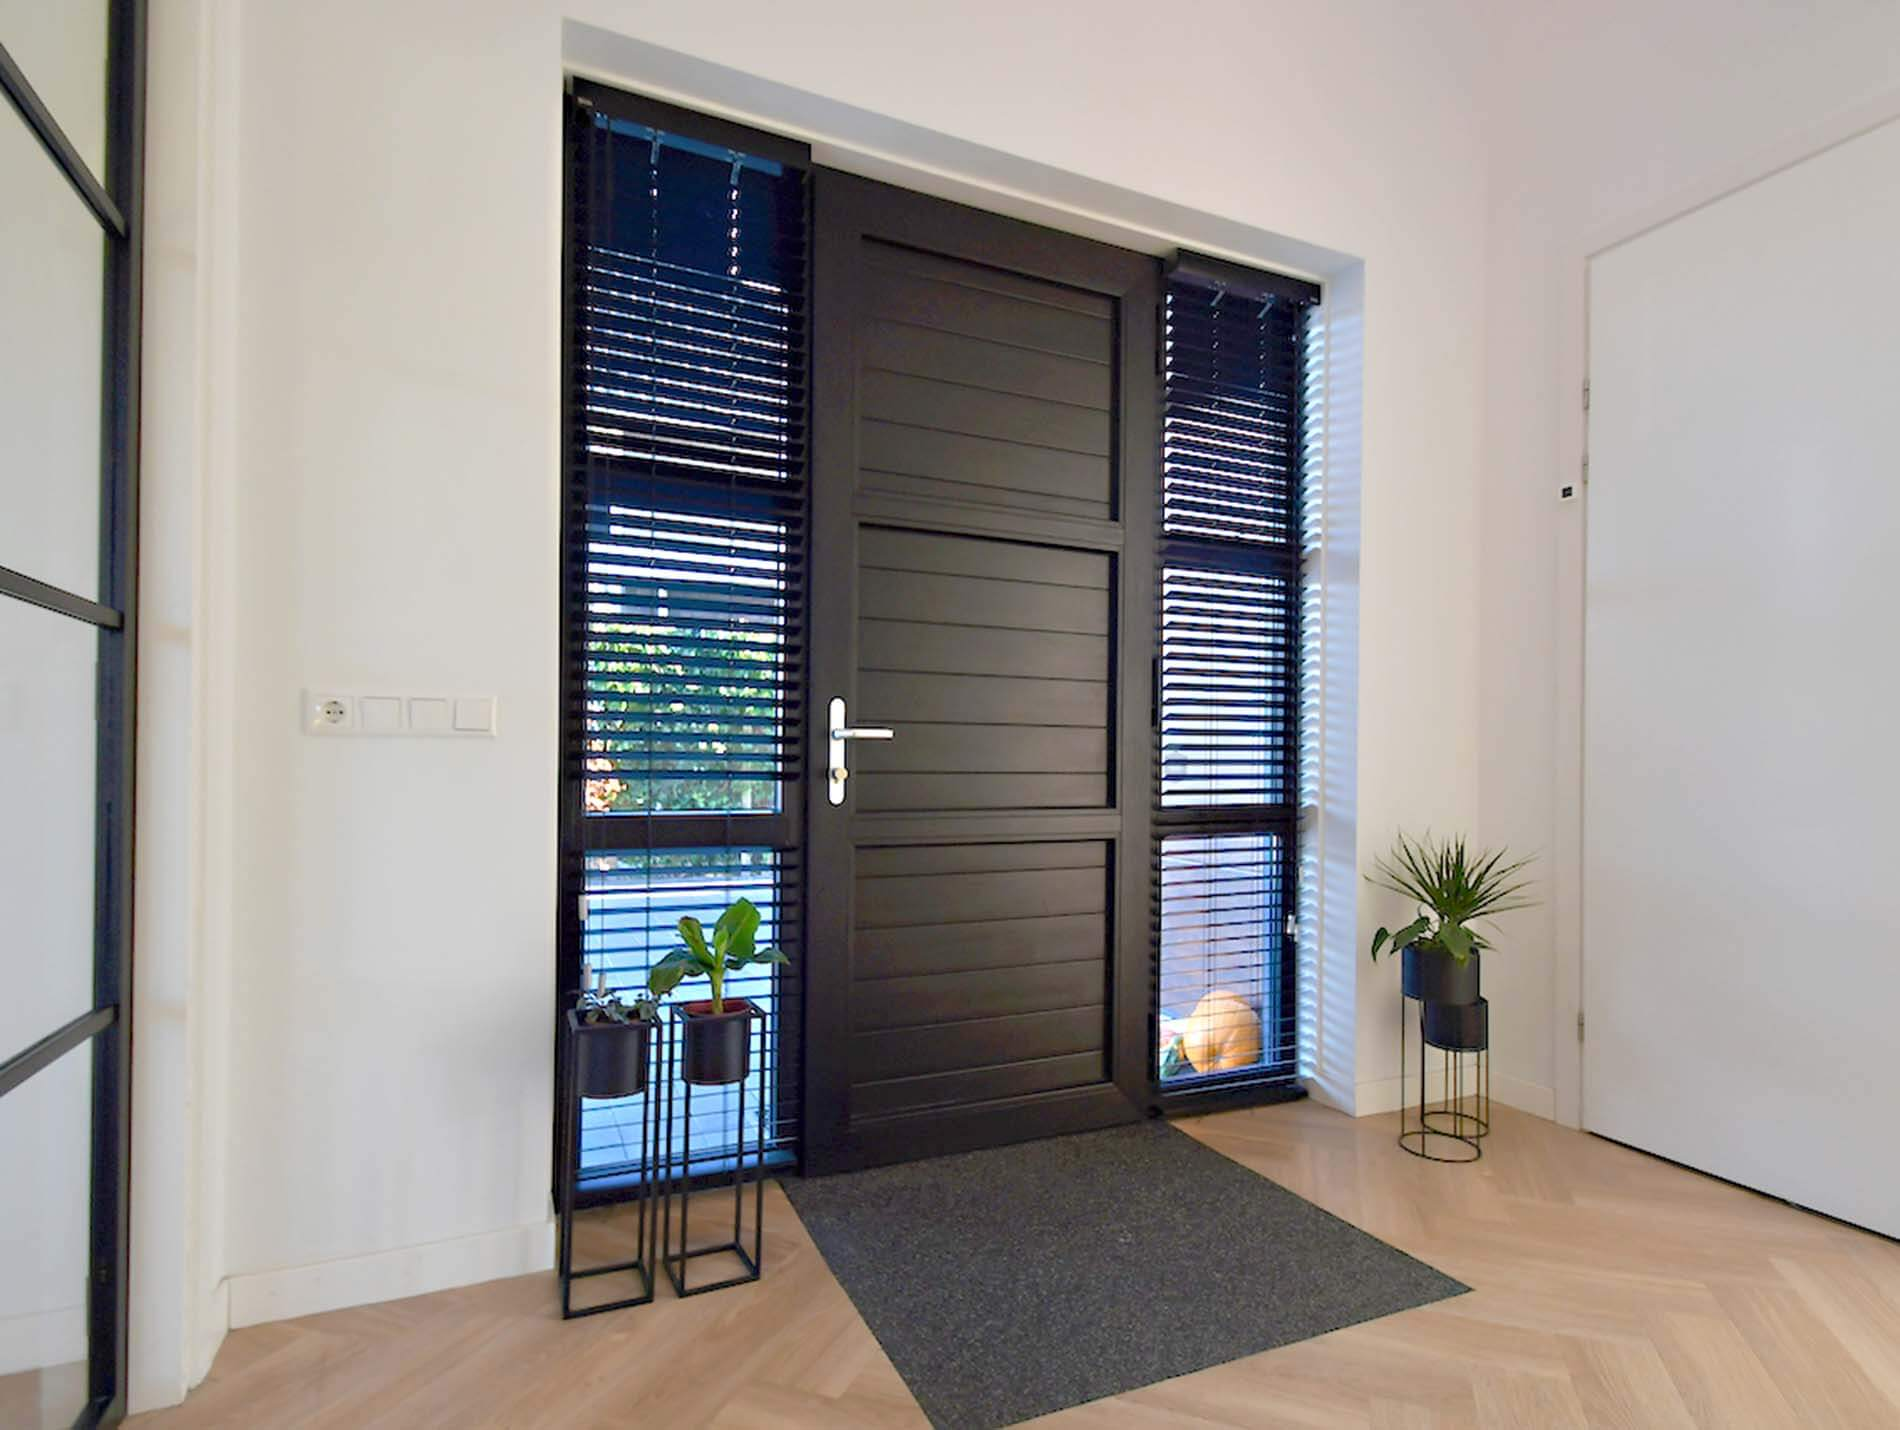 2. Interieur-drachten-nieuwbouw-woning-1900x1430p.jpg